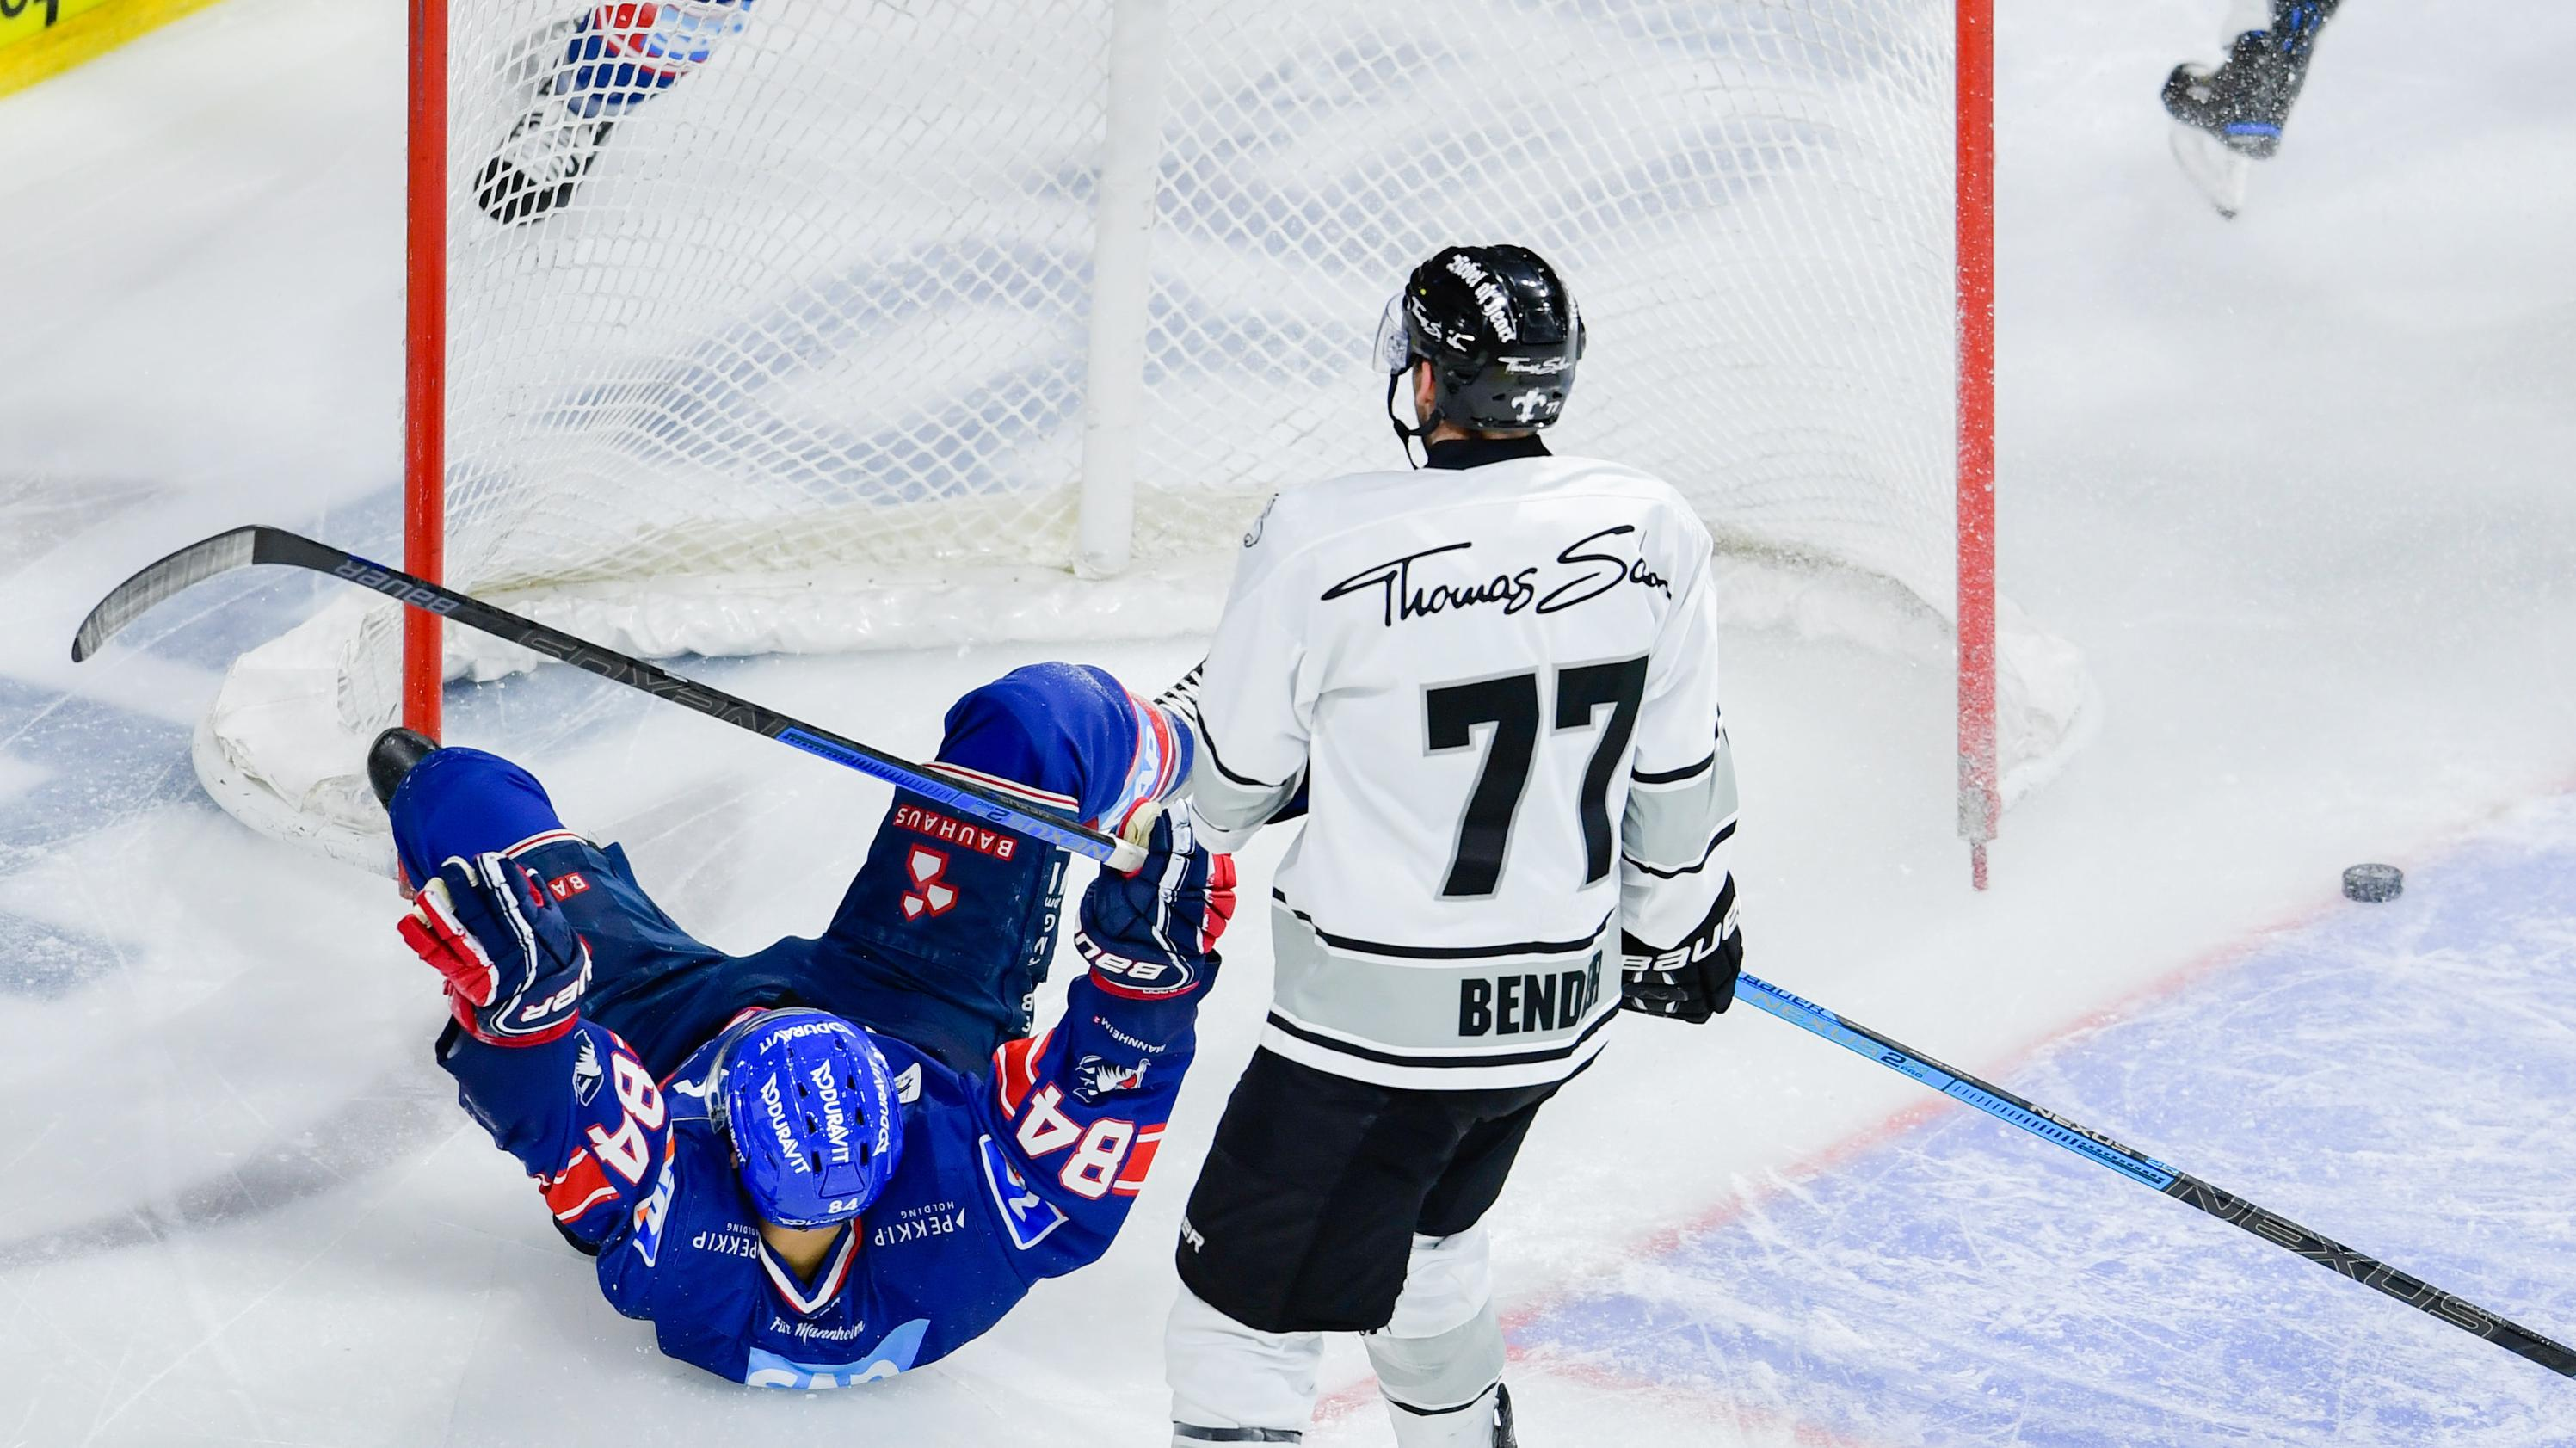 Nürnbergs Keeper Tim Bender kassiert einen Gegentreffer